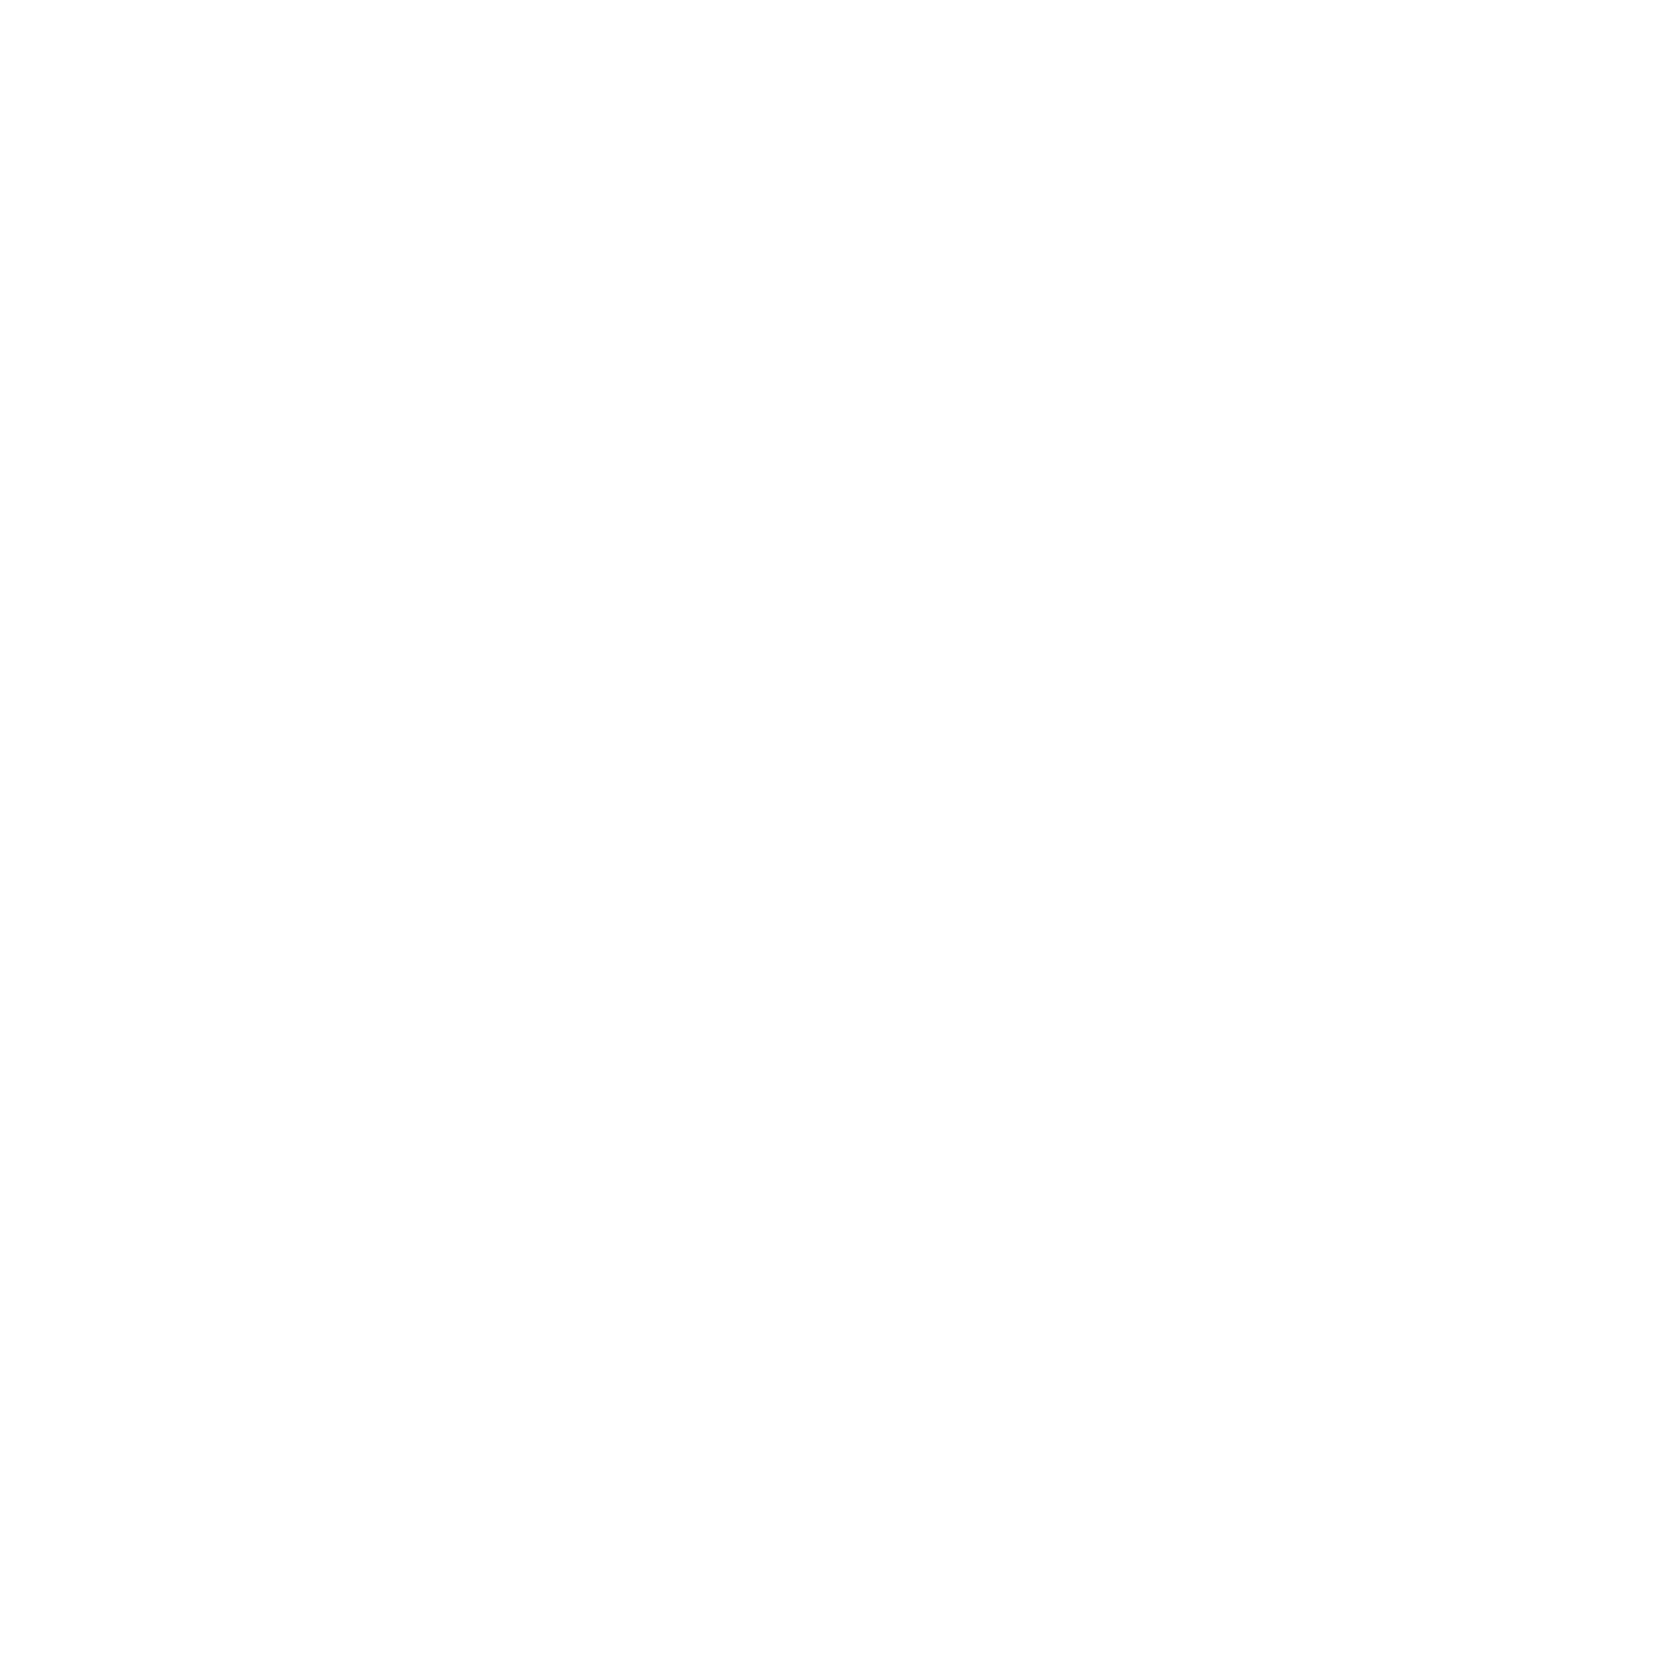 Churchfields Junior School logo portrait white